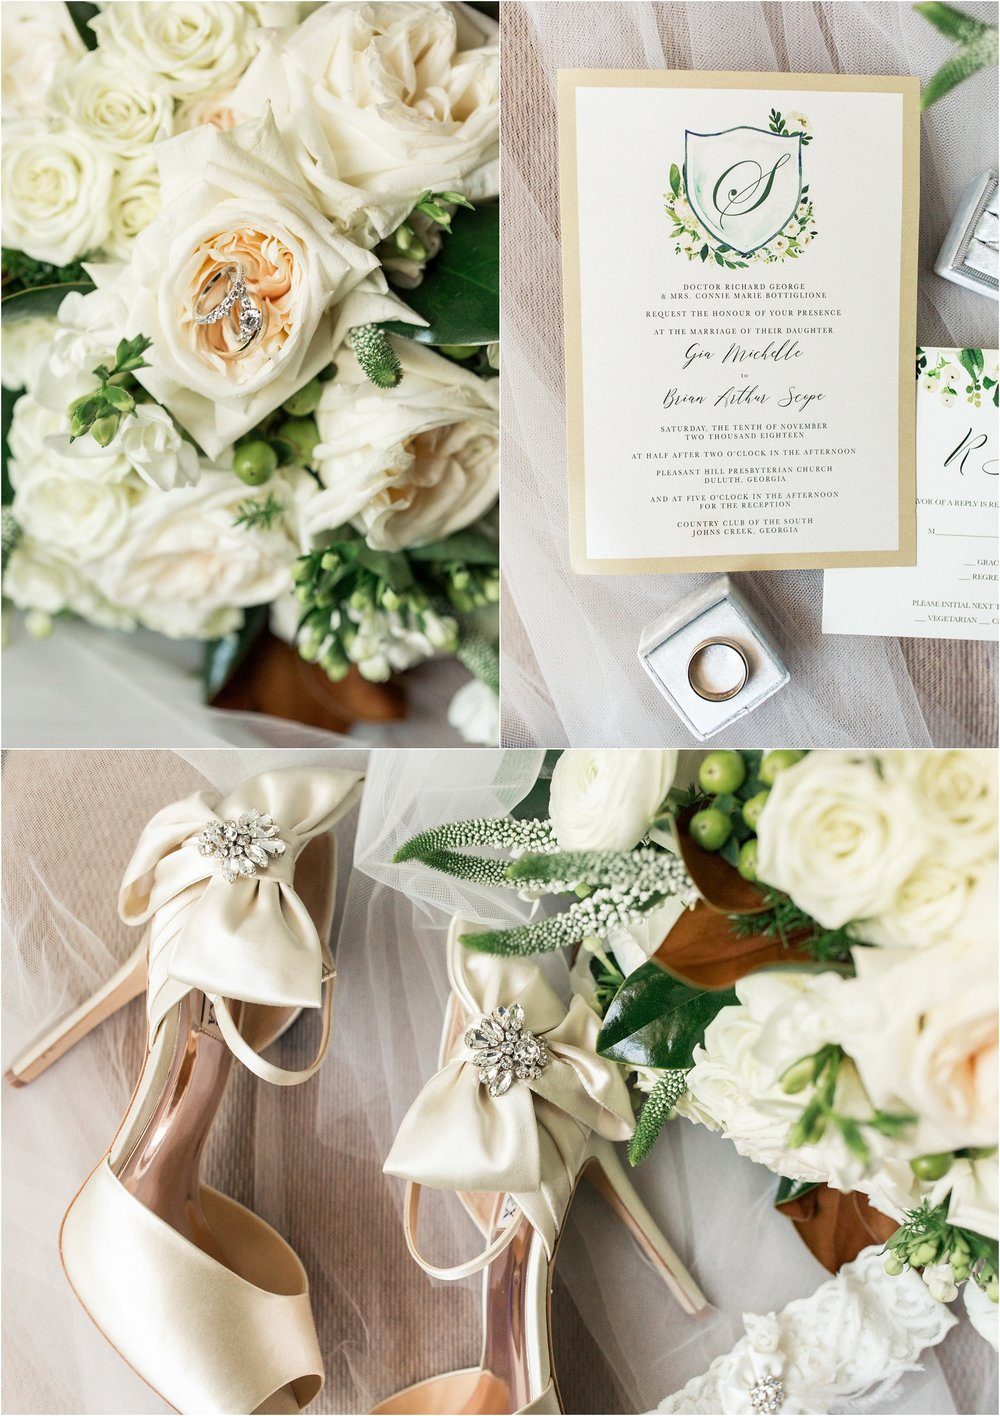 Savannah Eve Photography- Bottiglion-Scope Wedding- Sneak Peek-2.jpg